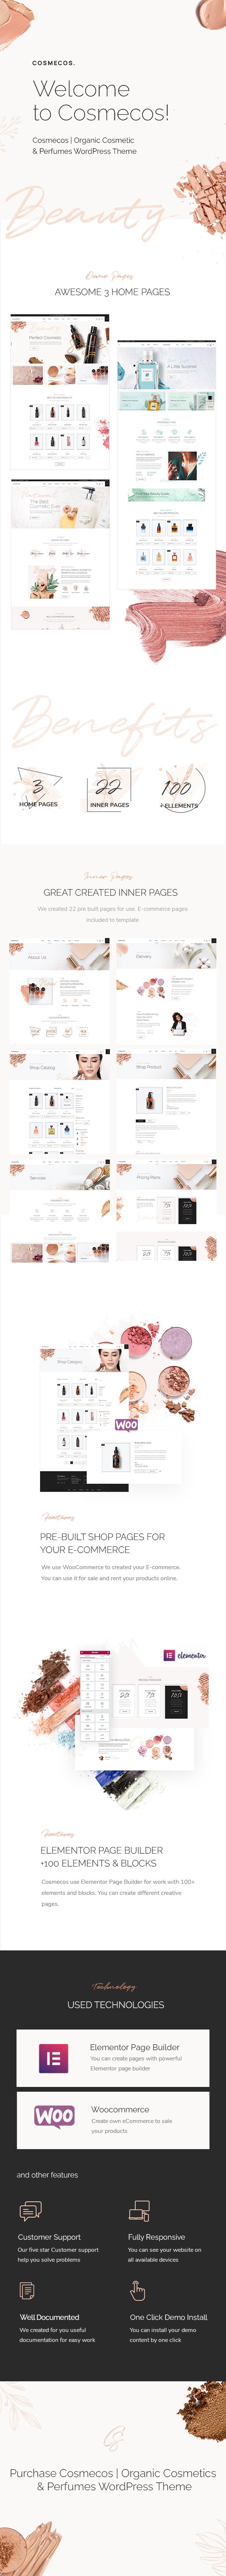 Cosmecos | Cosmetics & Perfumes WordPress Theme - 2